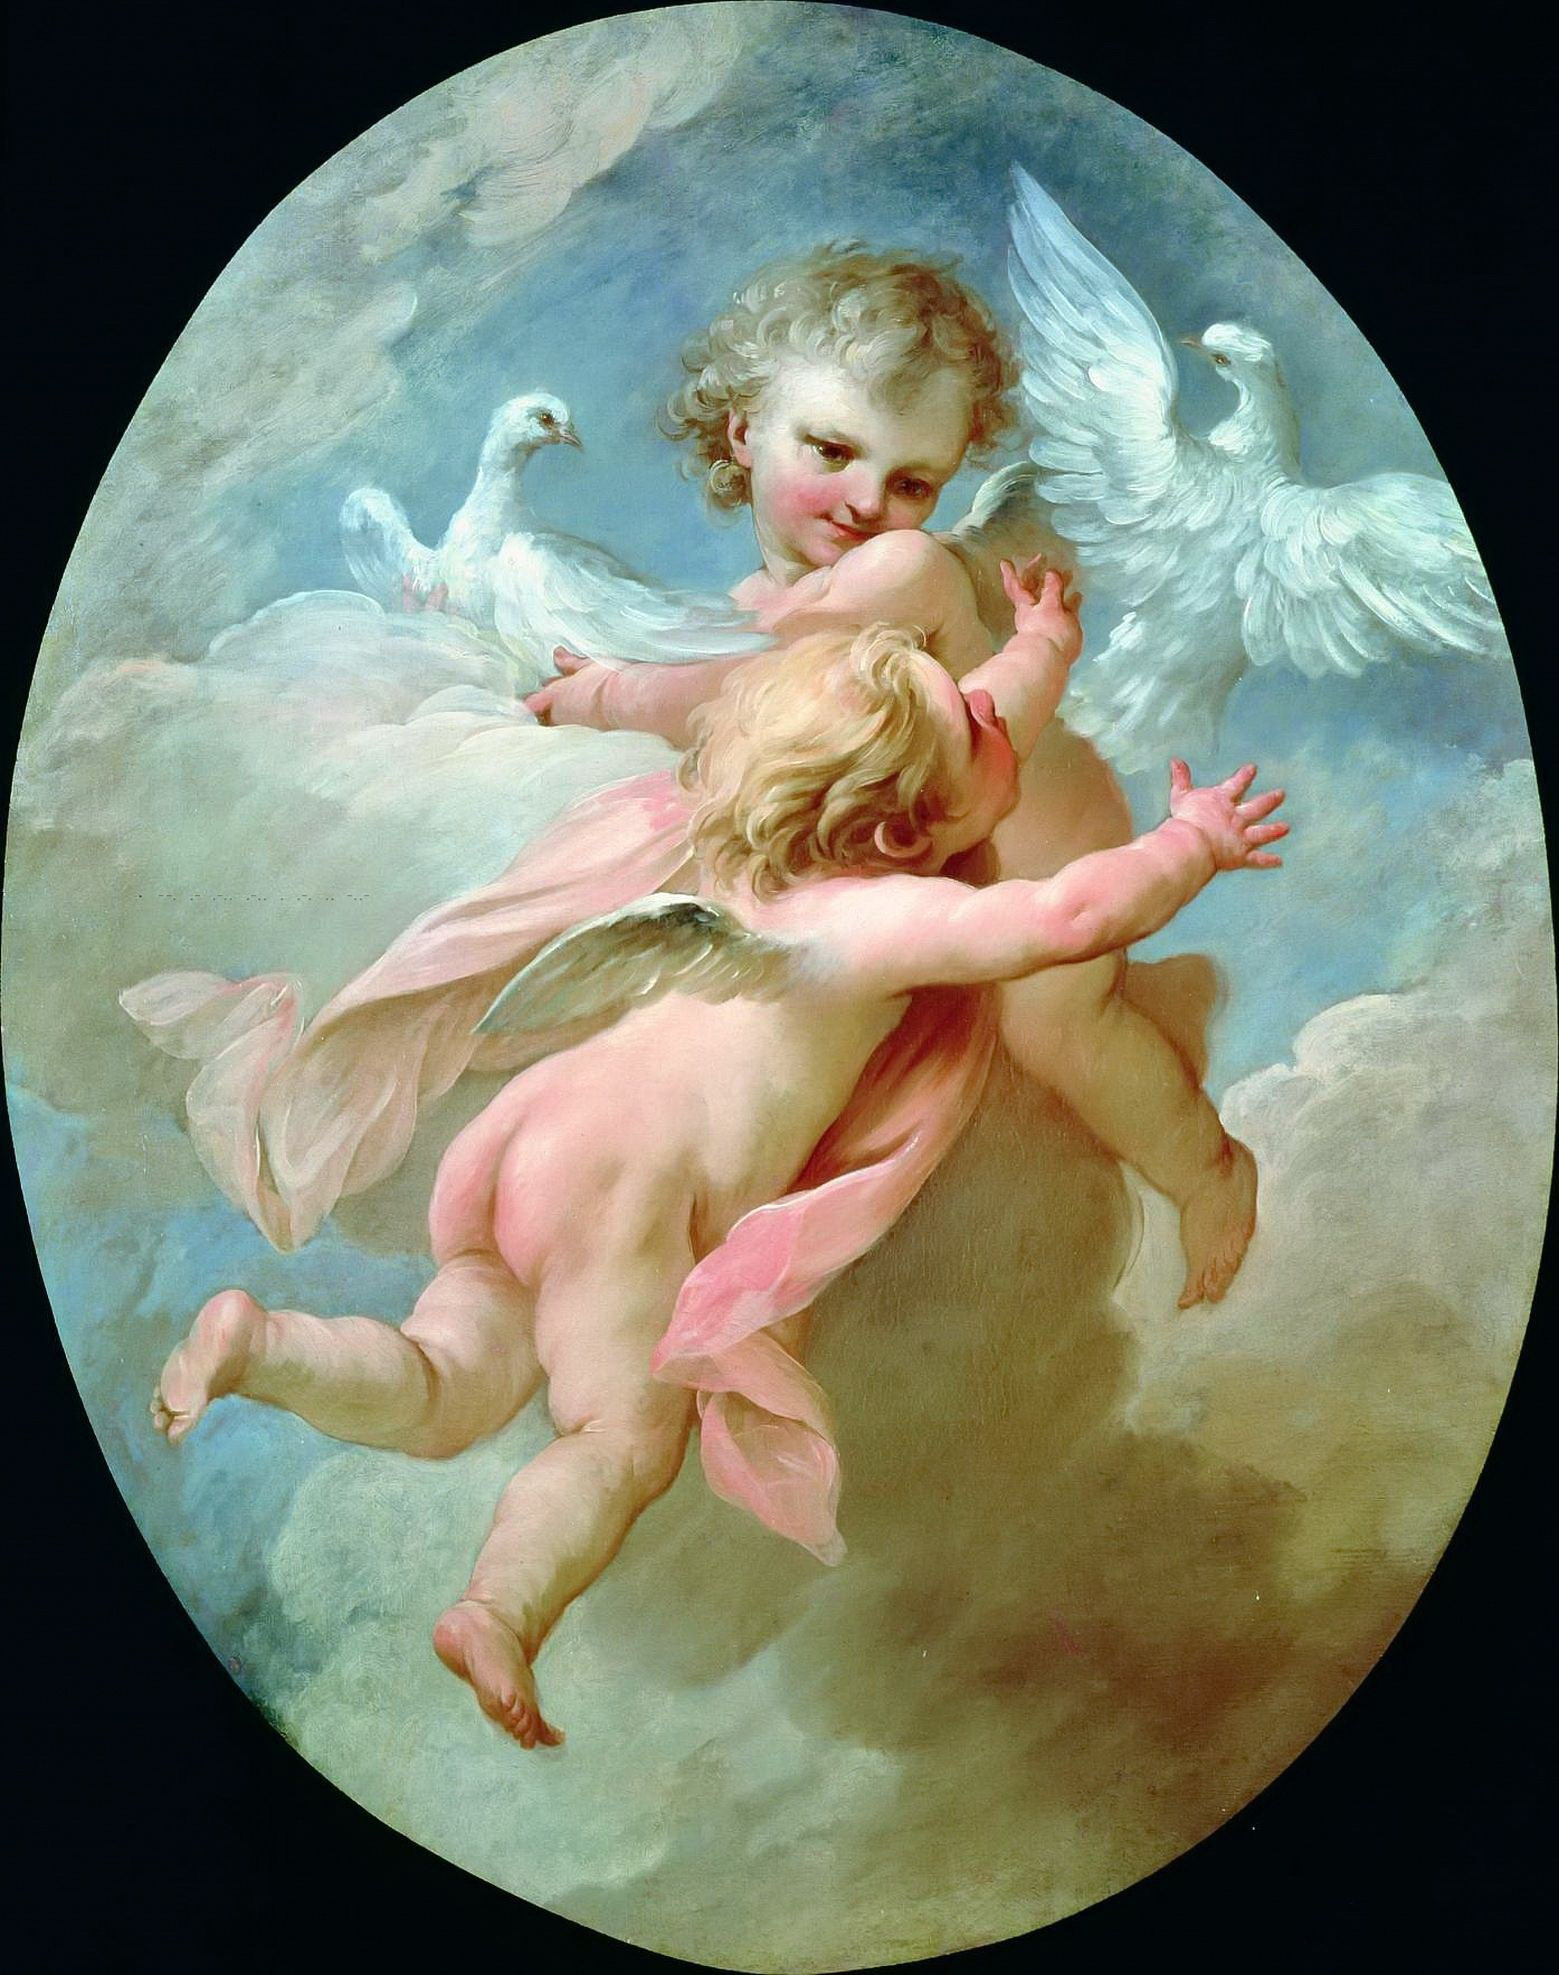 поставить картинки античные ангелочки якутка, сахалярка метиска